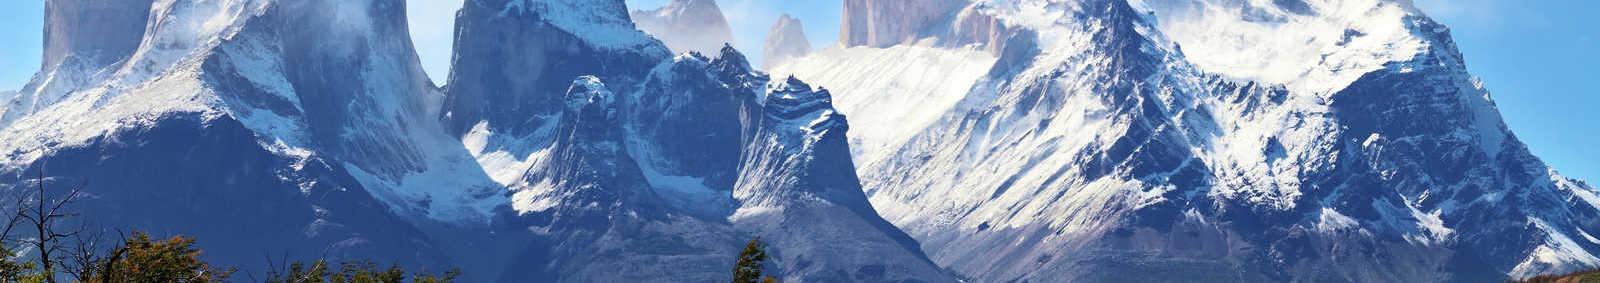 patagonia mountains